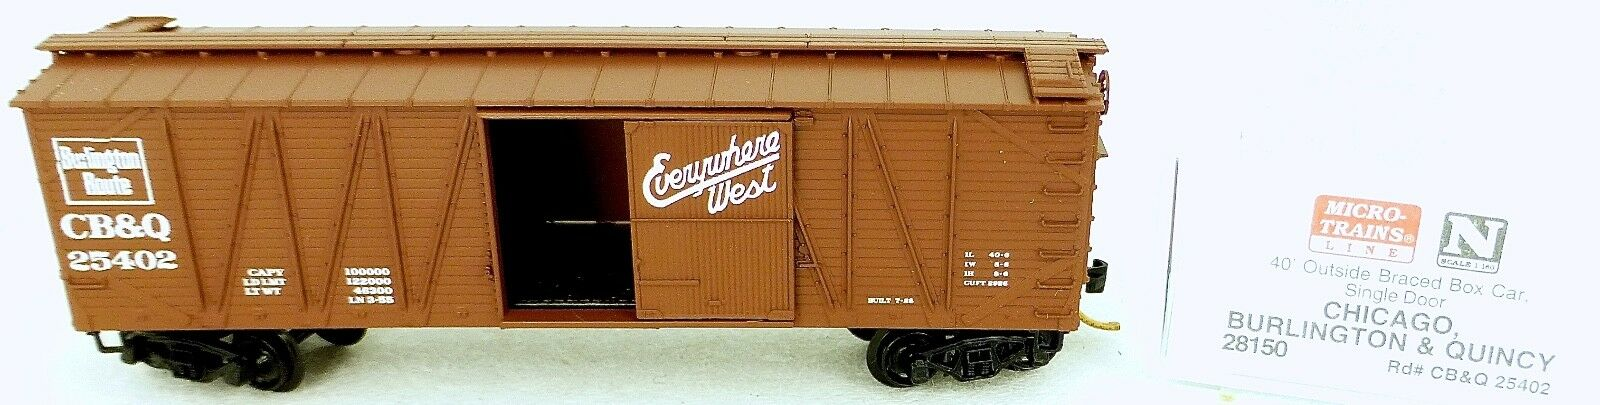 40 25402 ´ Outside Braced Boxcar Cb&q 25402 40 Micro Trains Line 28150 N 1 160 C Å 40f9d5